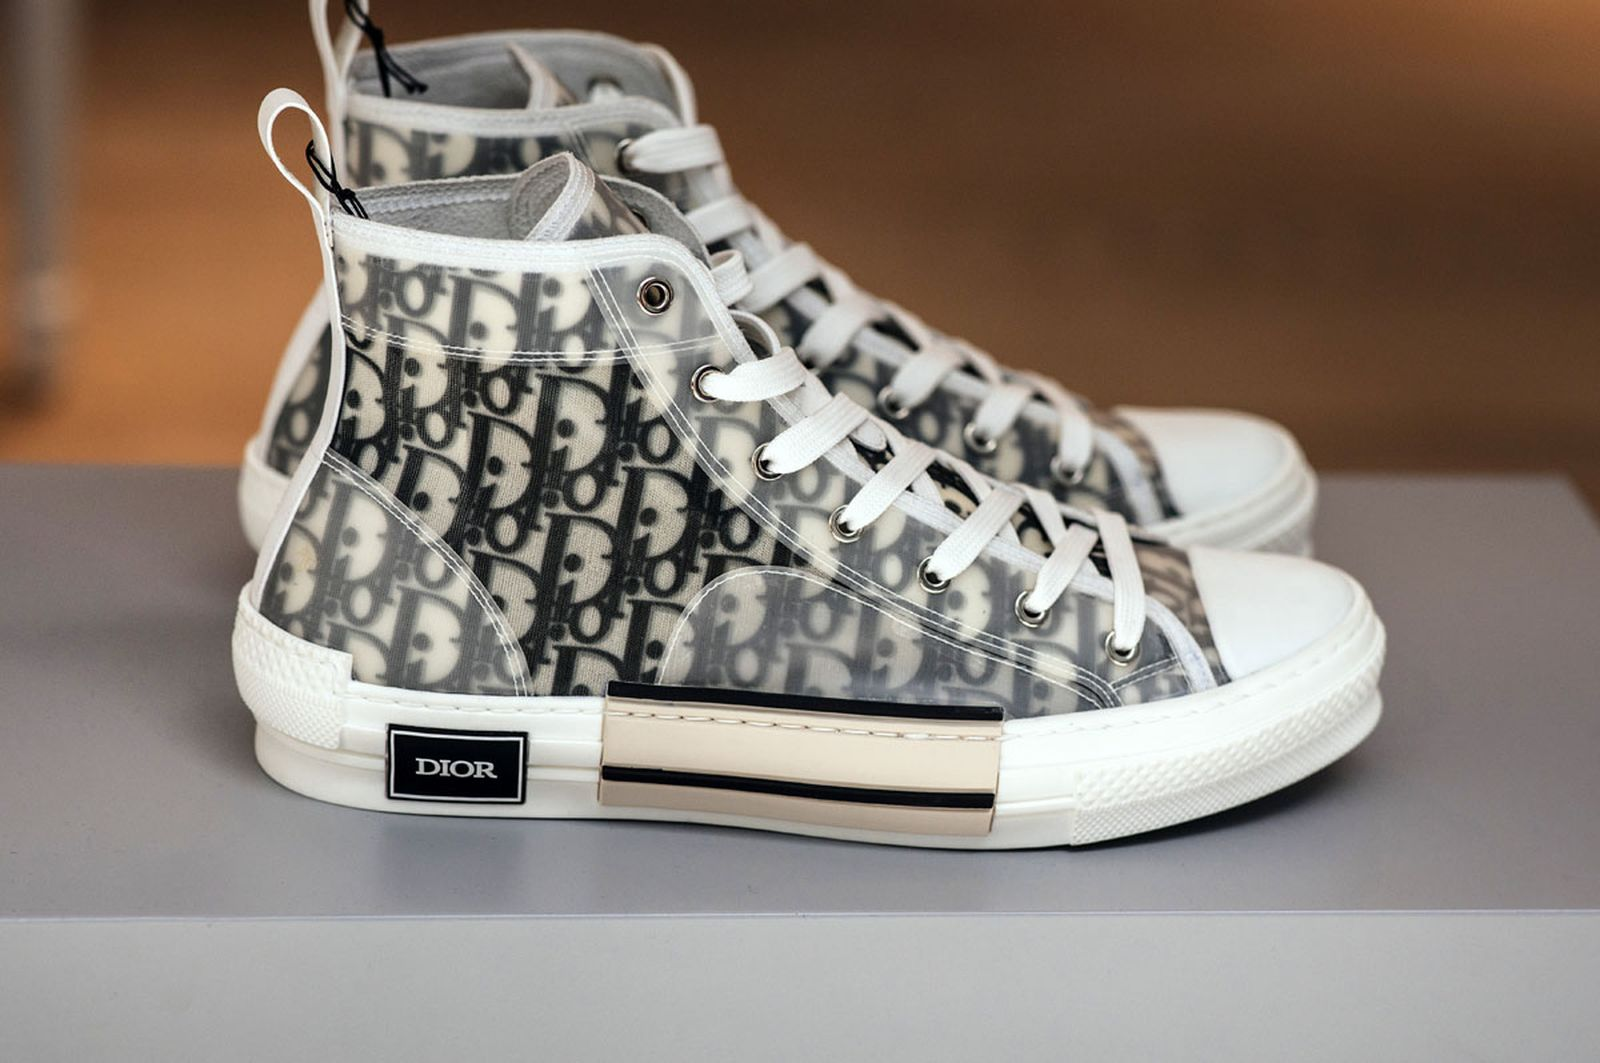 dior ss19 sneakers9 kim jones